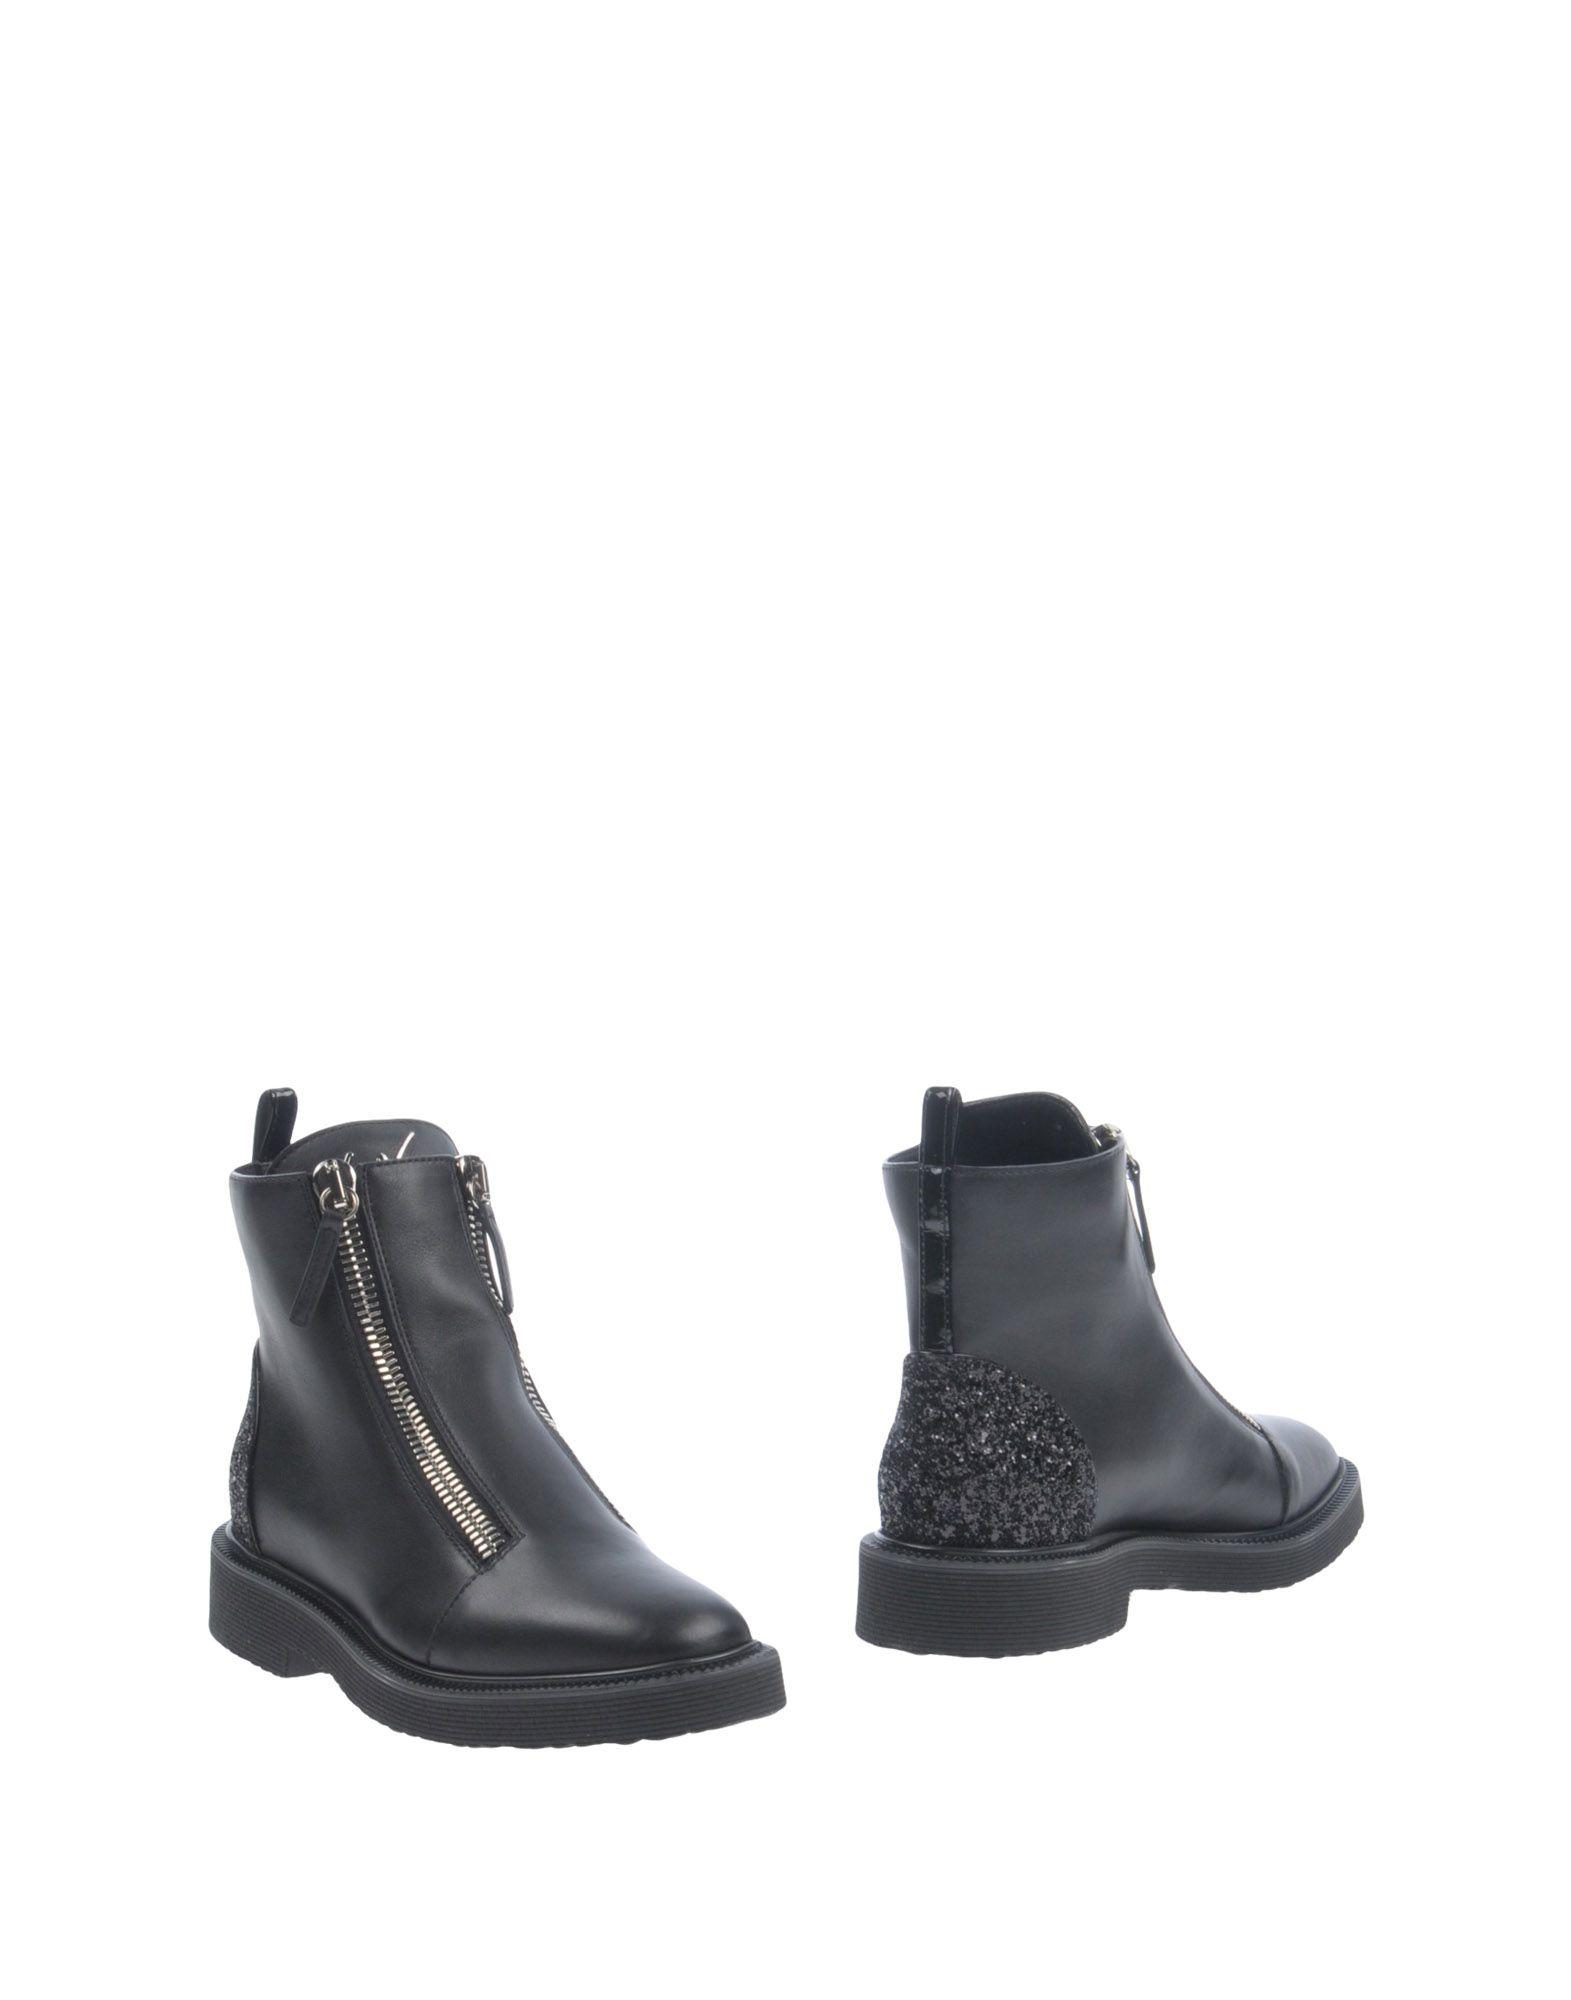 Bottine Giuseppe Zanotti Femme - Bottines Giuseppe Zanotti Noir Dernières chaussures discount pour hommes et femmes